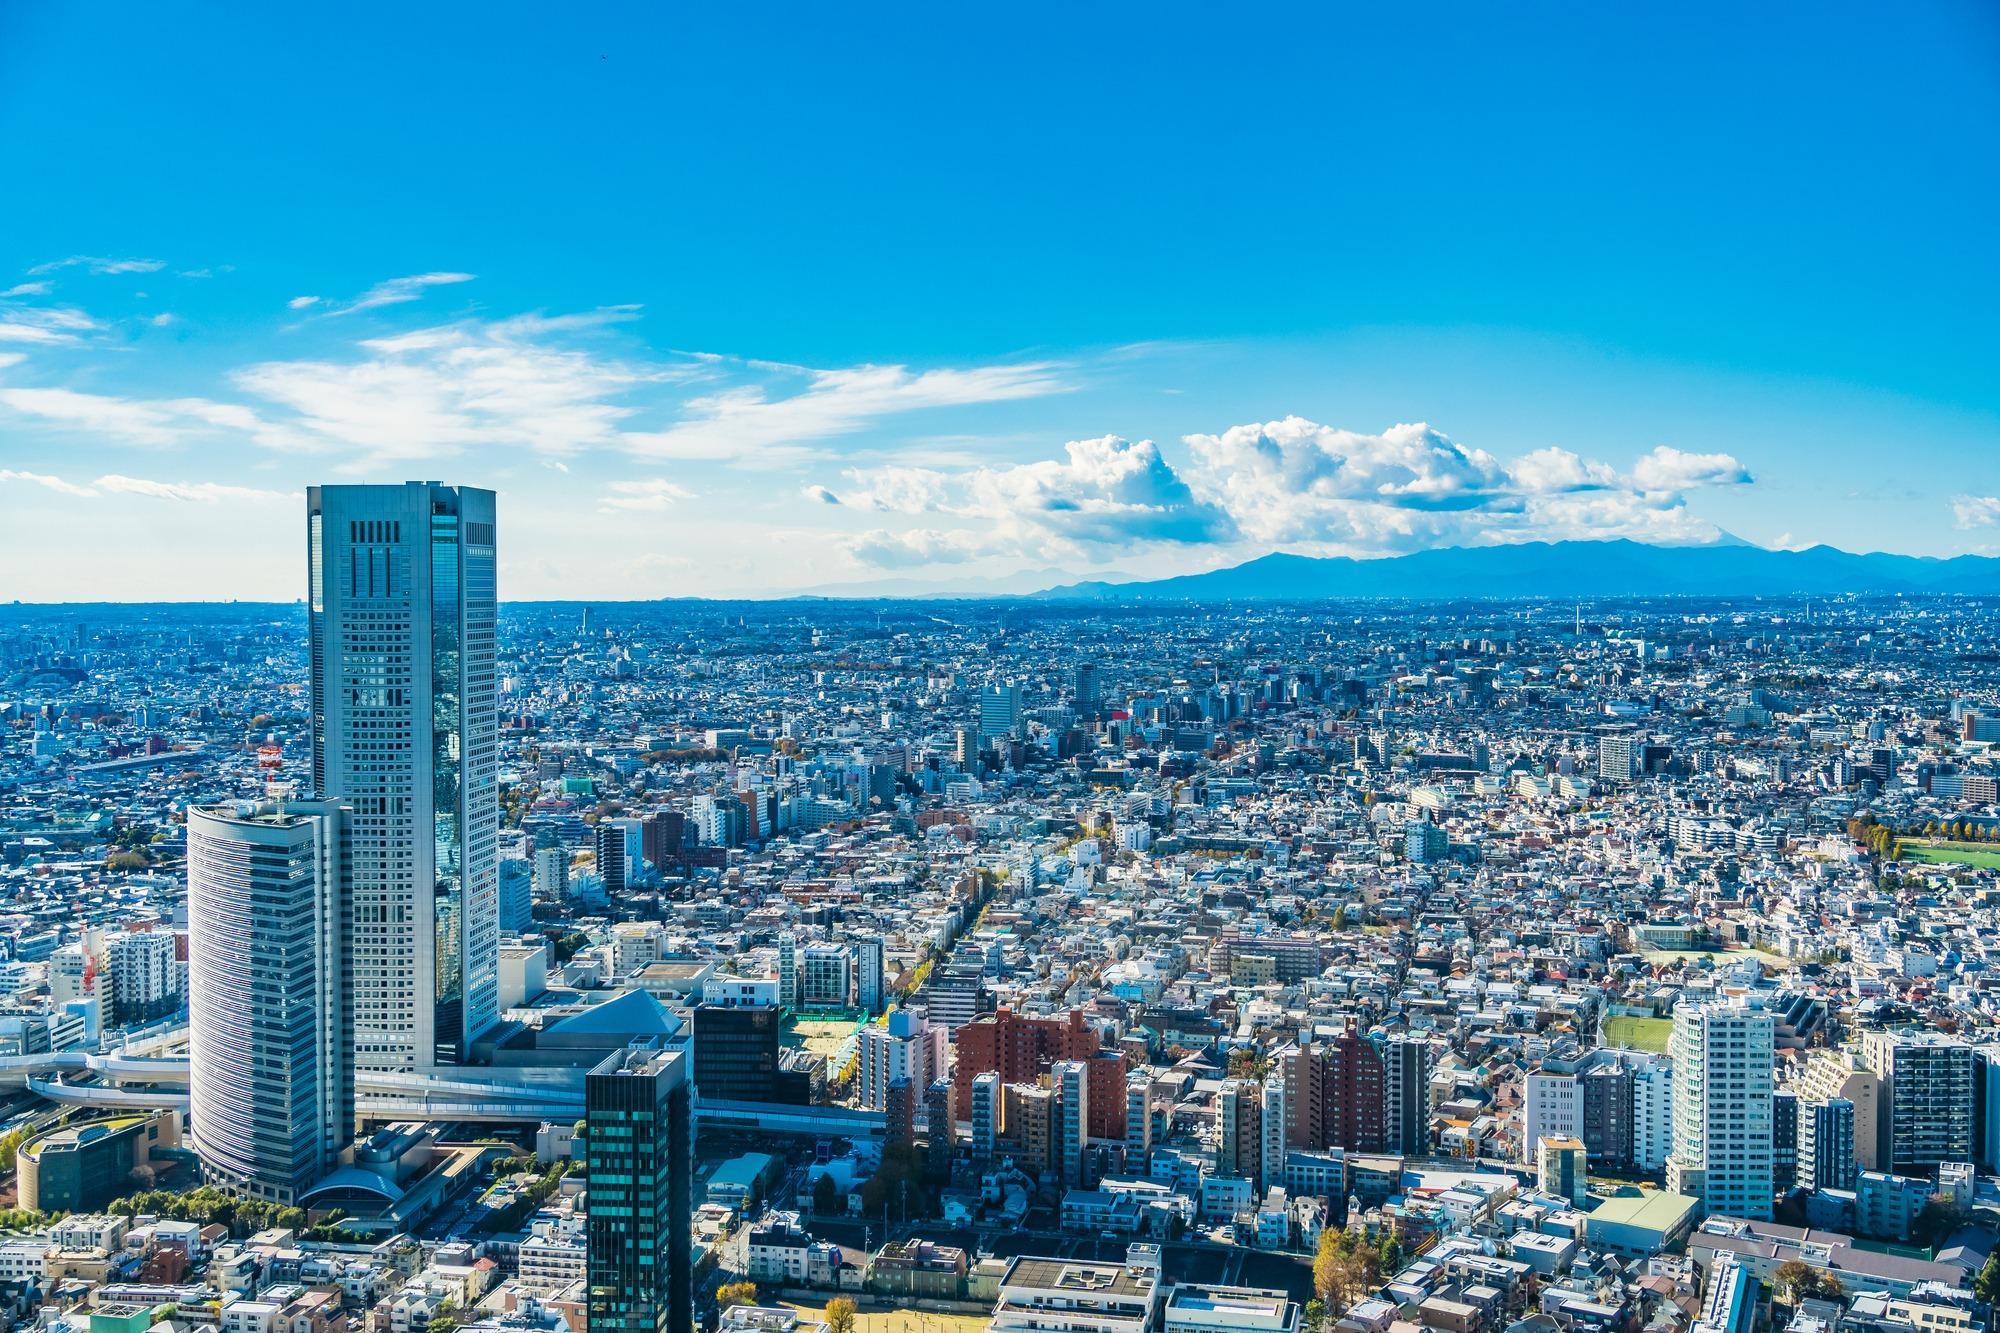 世田谷区の不用品回収業者 総合評価ランキング2021【格安優良】